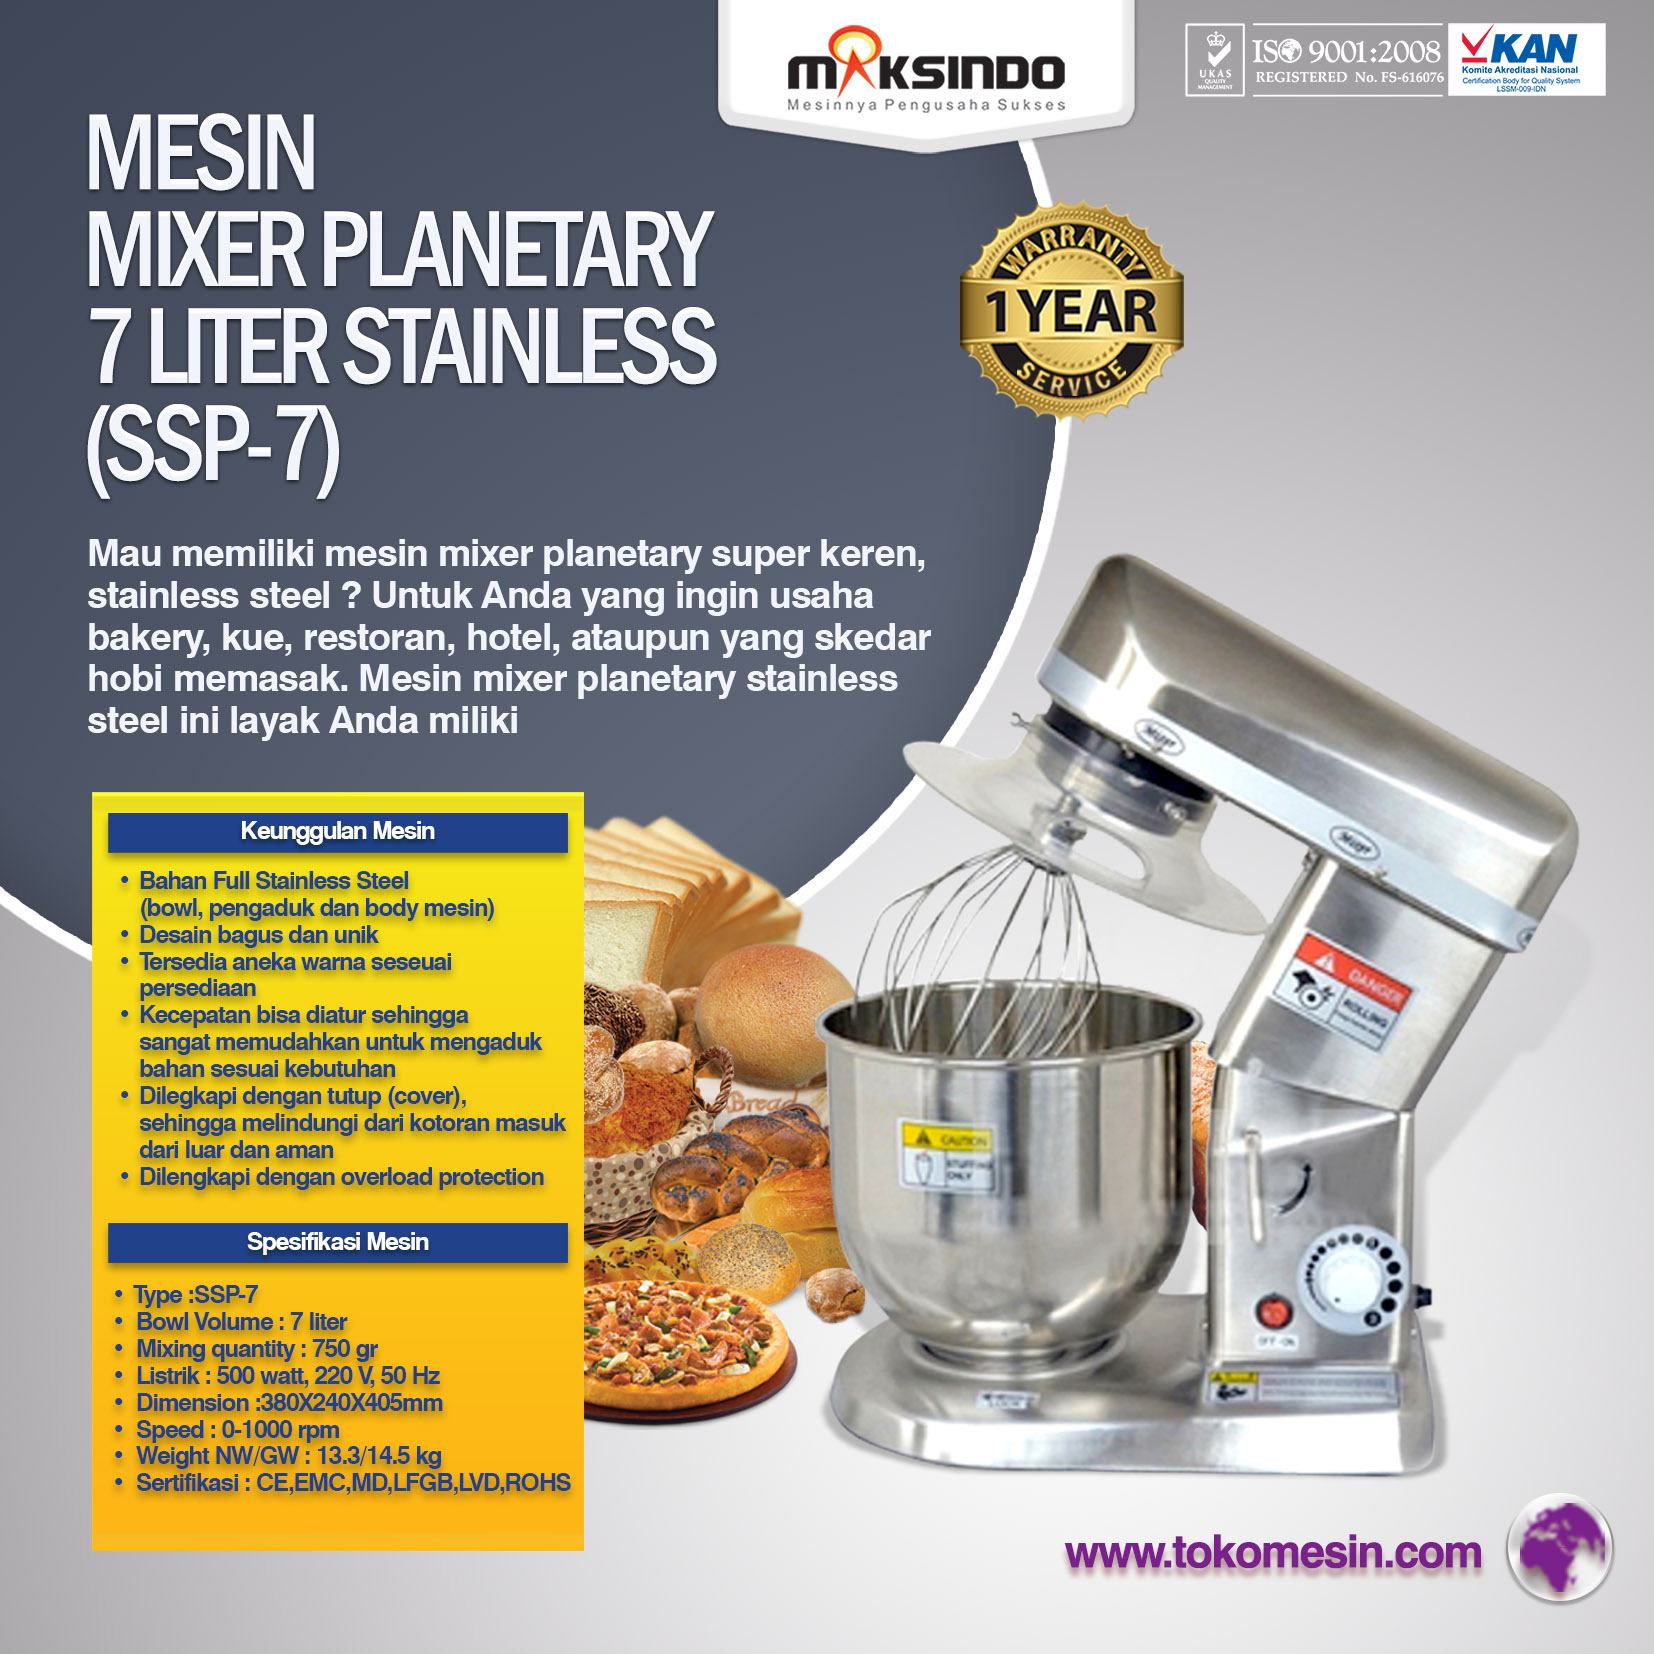 Mesin Mixer Planetary 7 Liter Stainless (SSP-7)